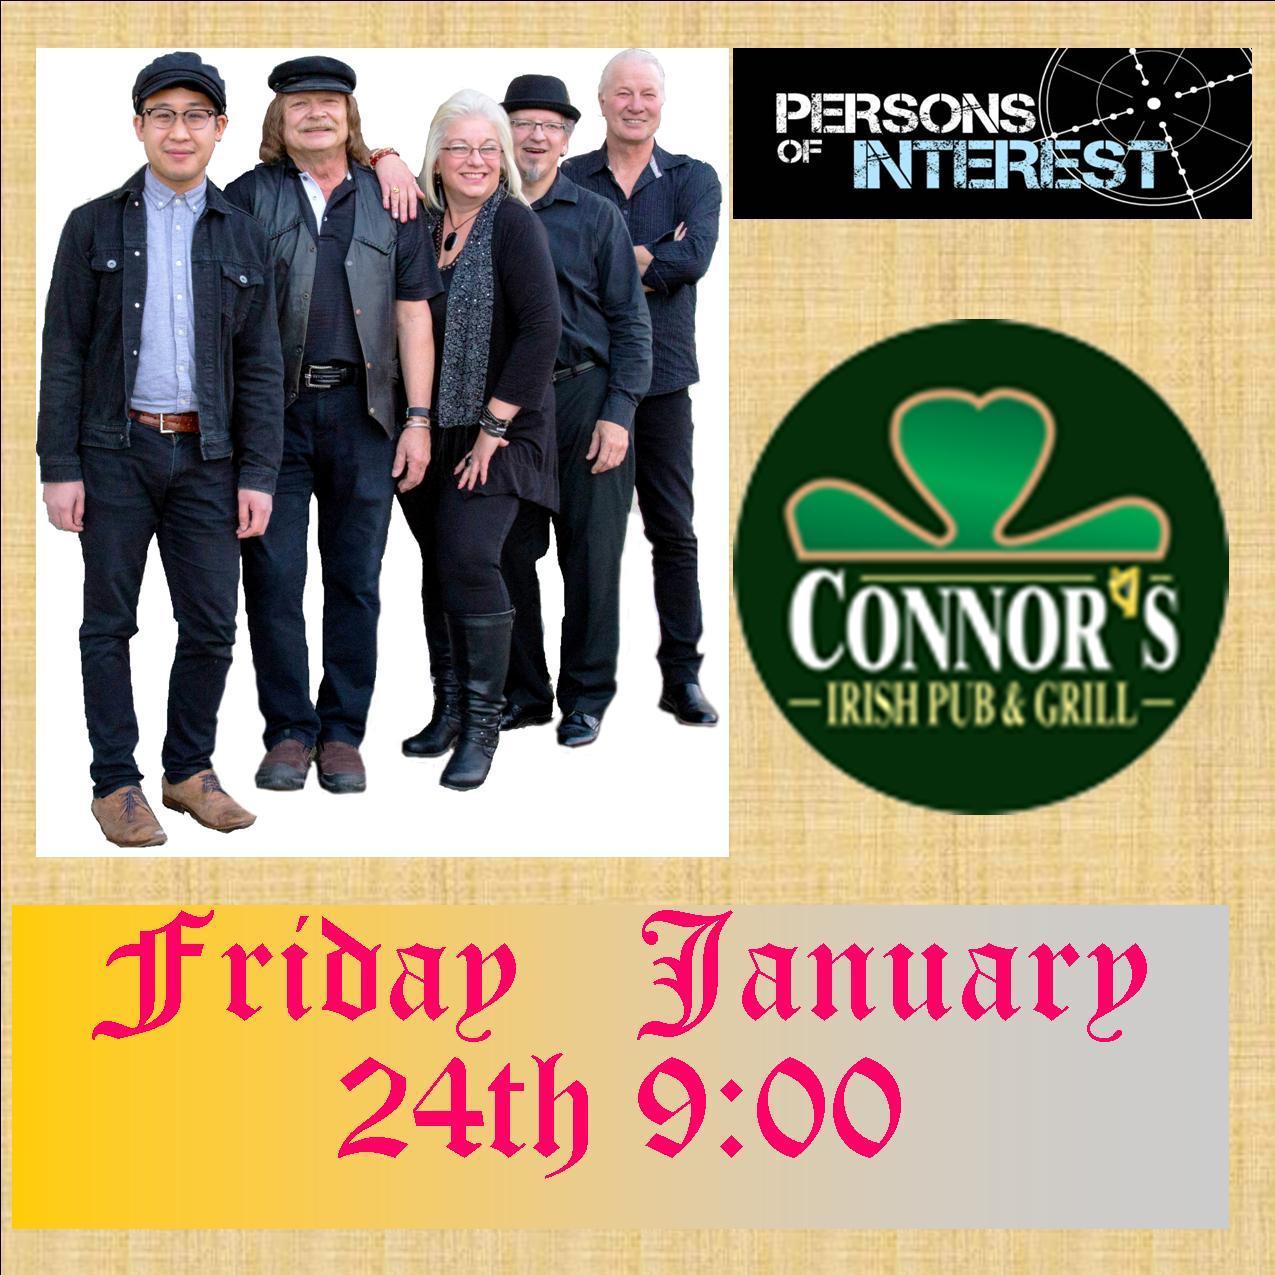 Persons of Interest return to Connors Irish Pub